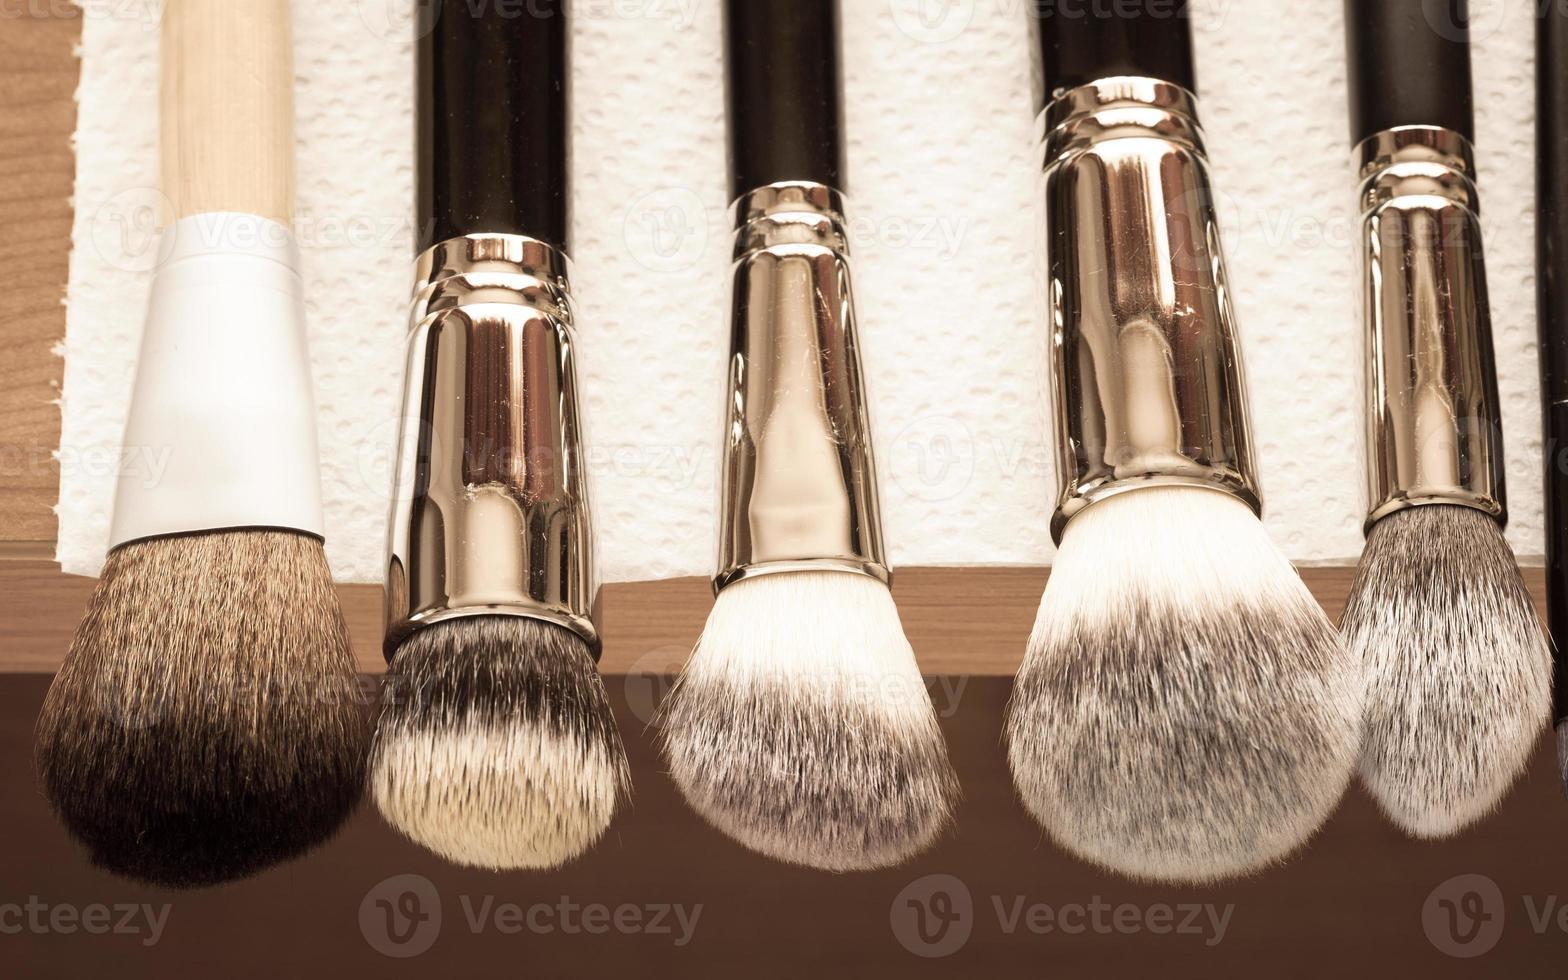 processo de limpeza de pincéis de maquiagem de secagem foto